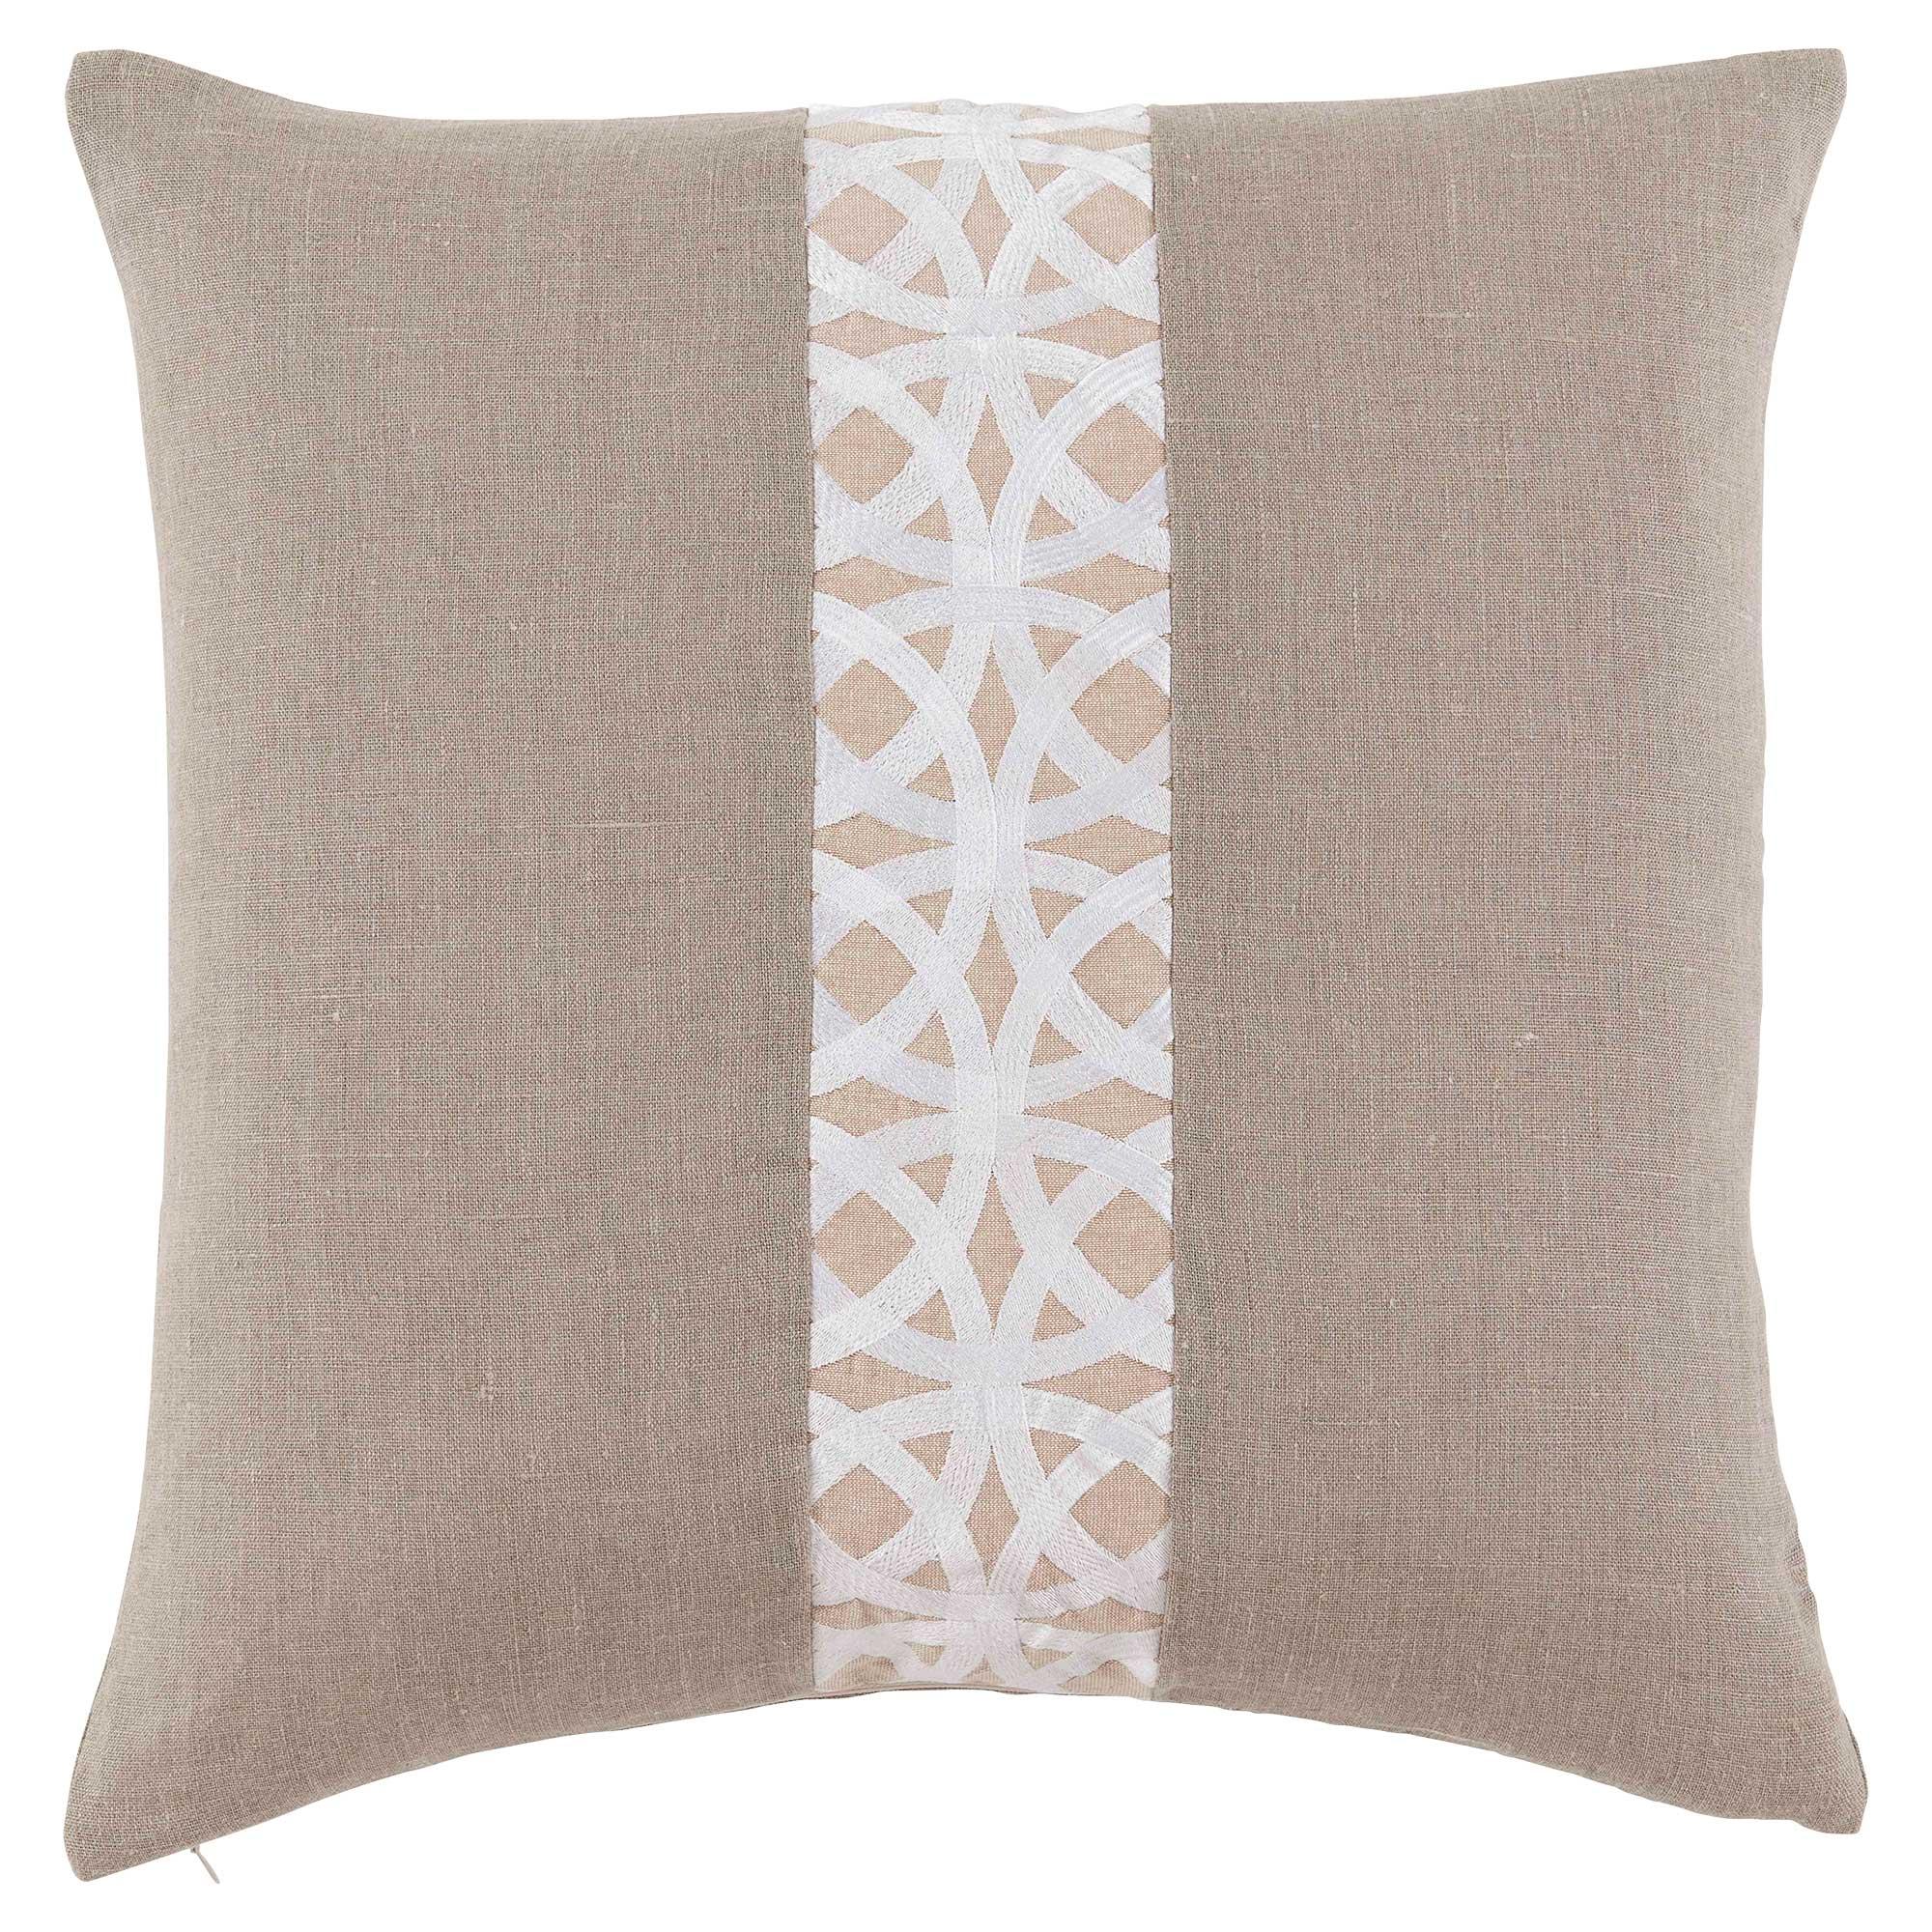 Dorsa Coastal Trellis Stripe Beige Linen Pillow - 22x22